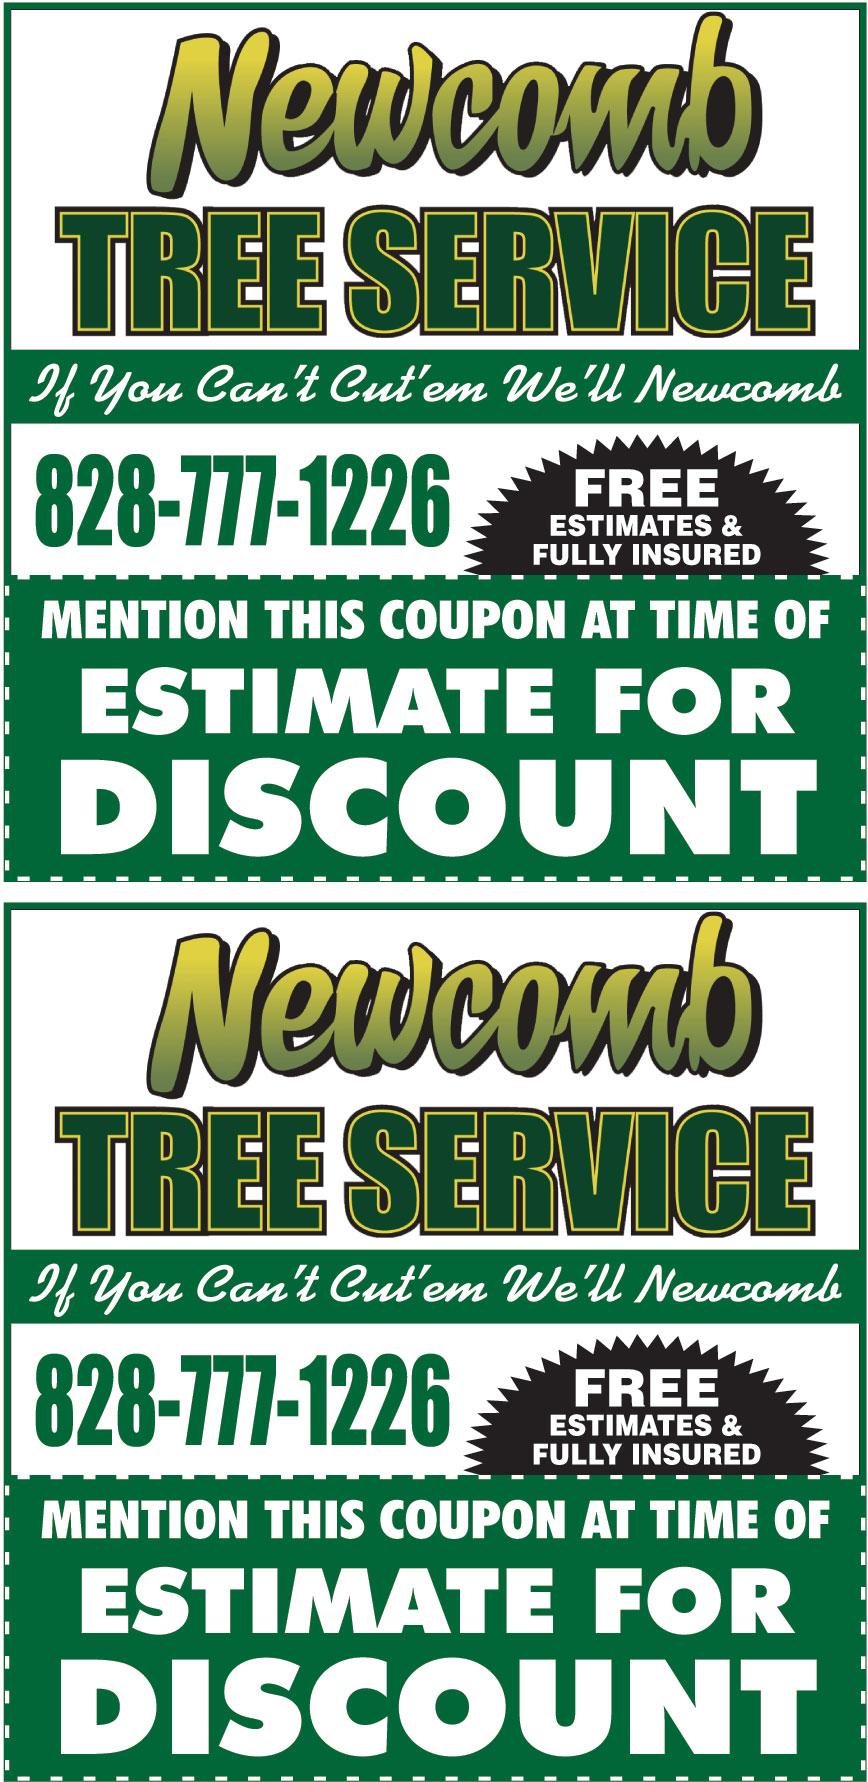 NEWCOMB TREE SERVICE